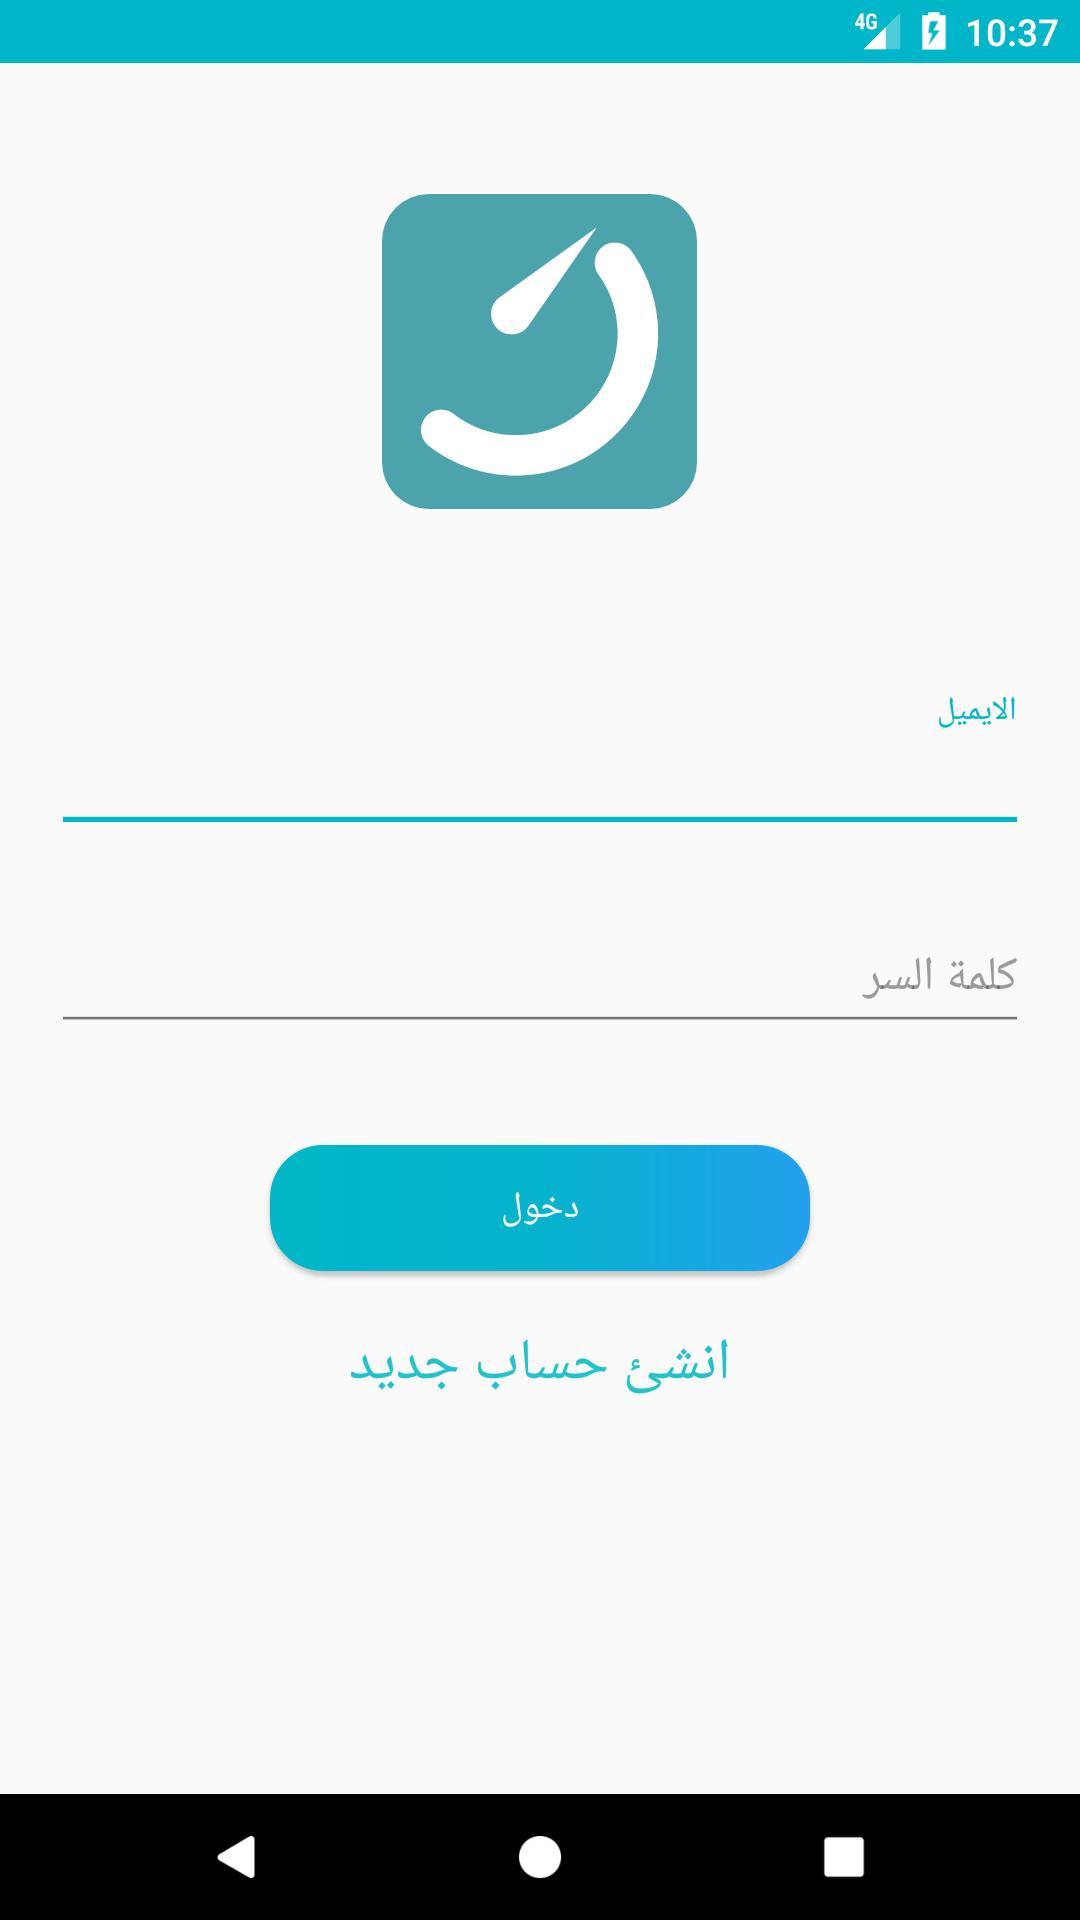 نون معلم For Android Apk Download